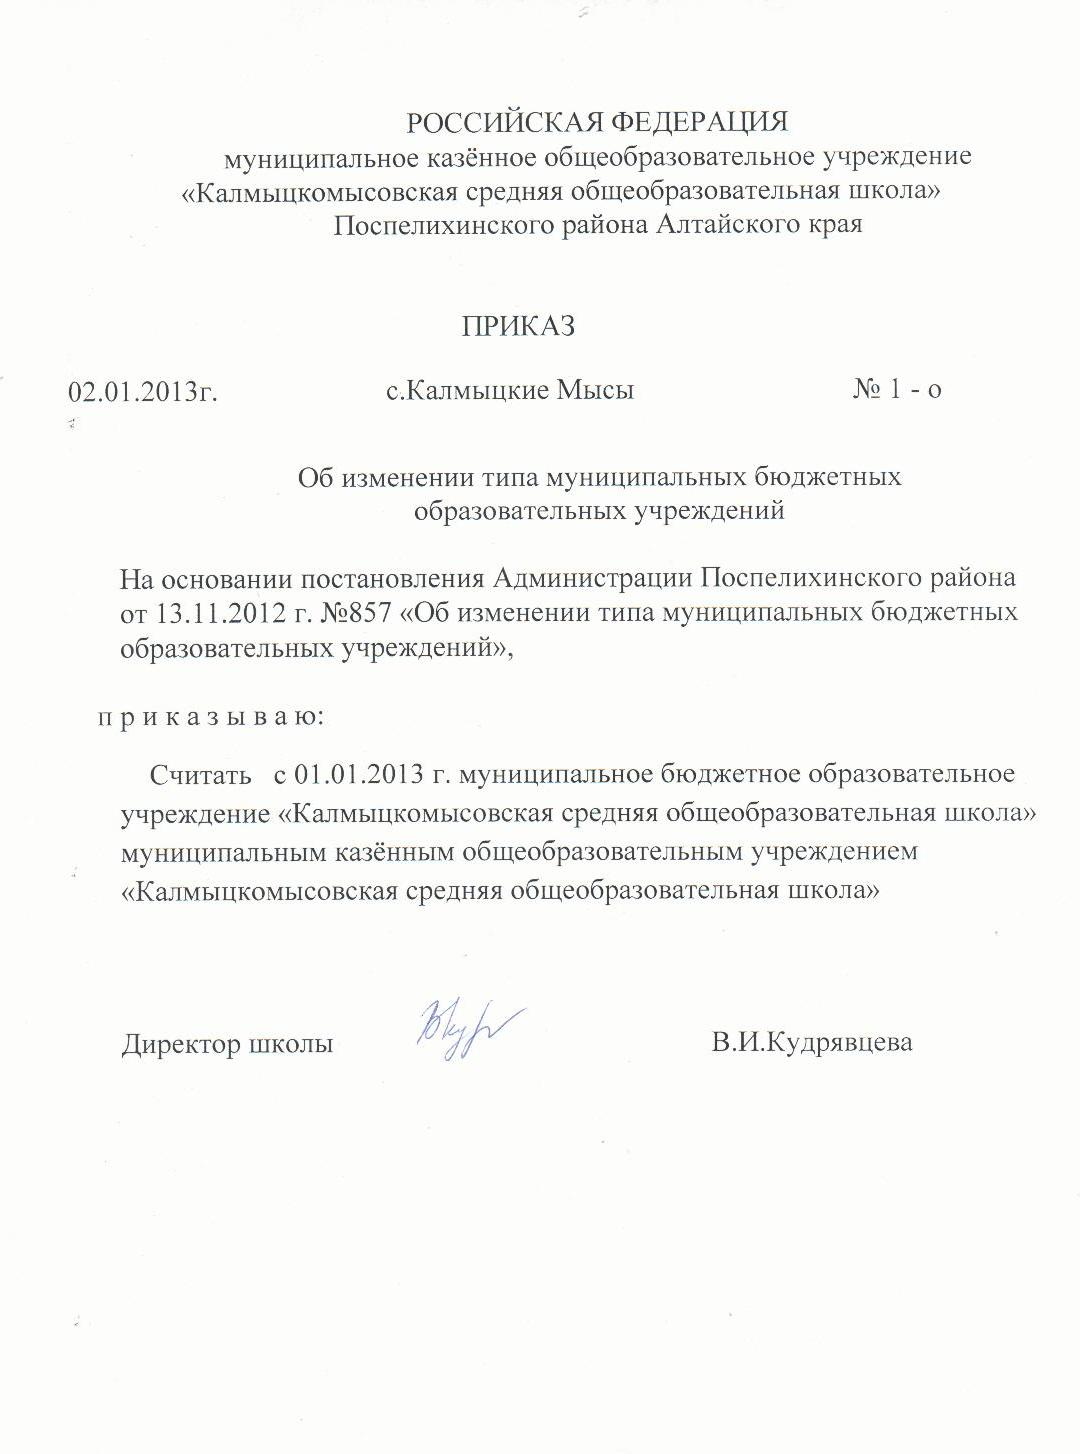 http://misi-schkol.ucoz.ru/Files/schol/PRIKAZ_perei.jpg